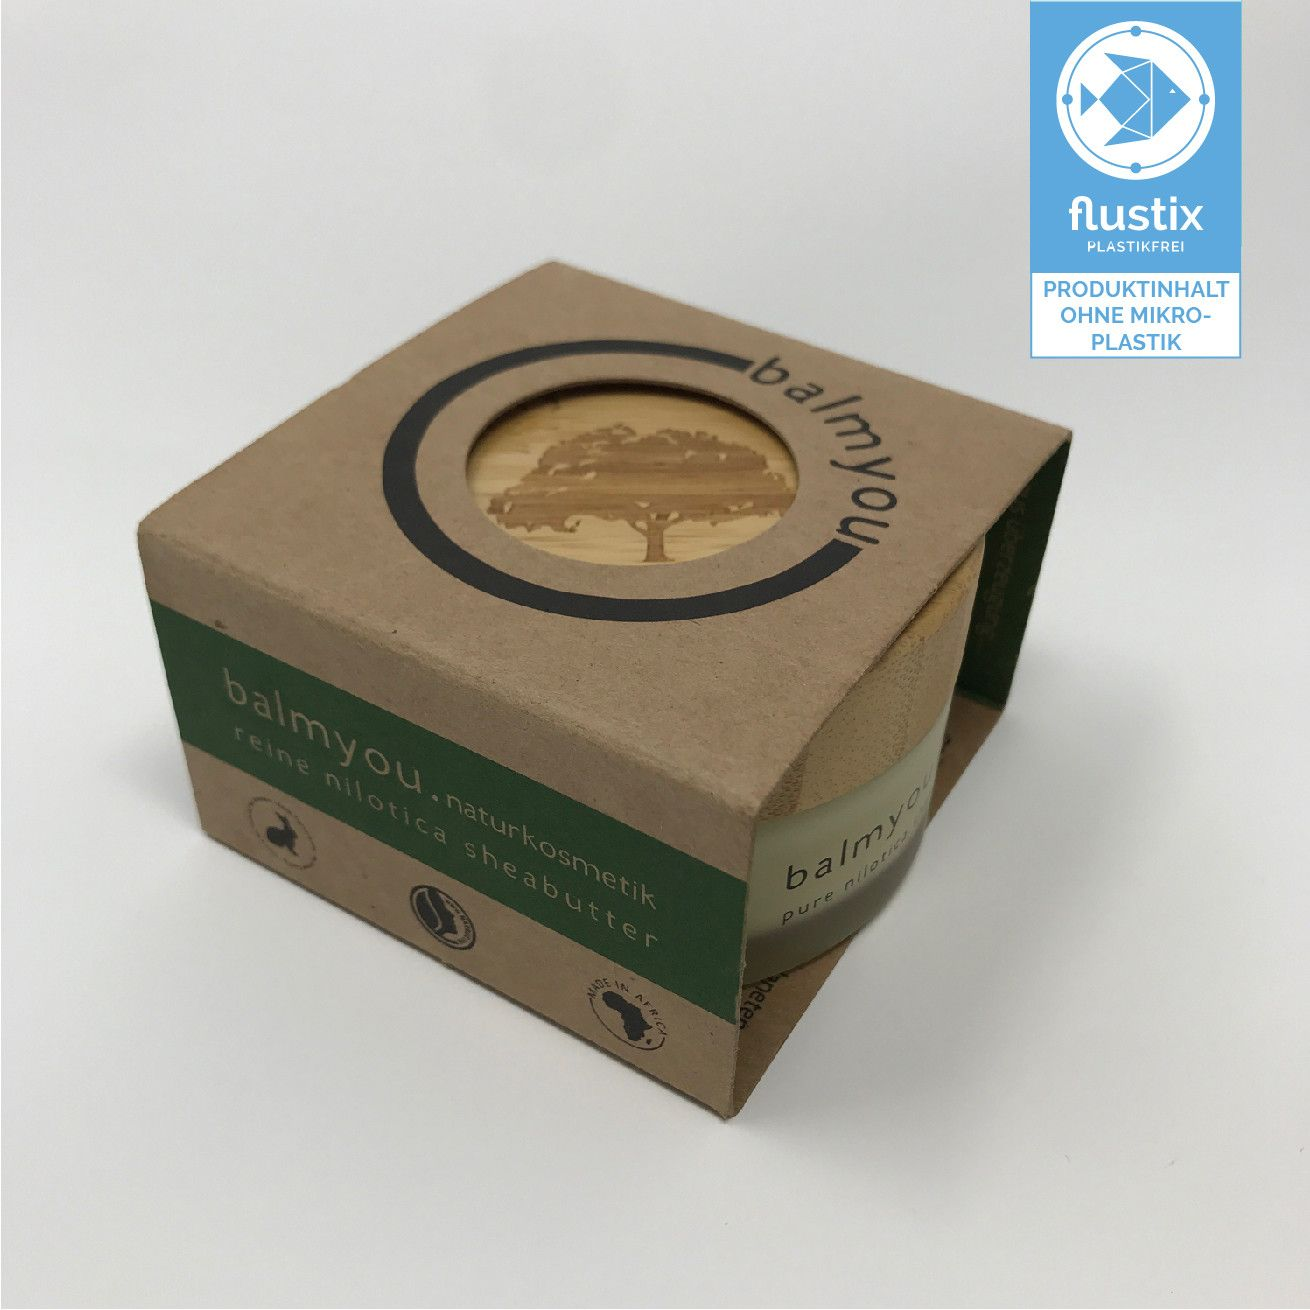 balmyou mikroplastikfrei Flustix-Siegel